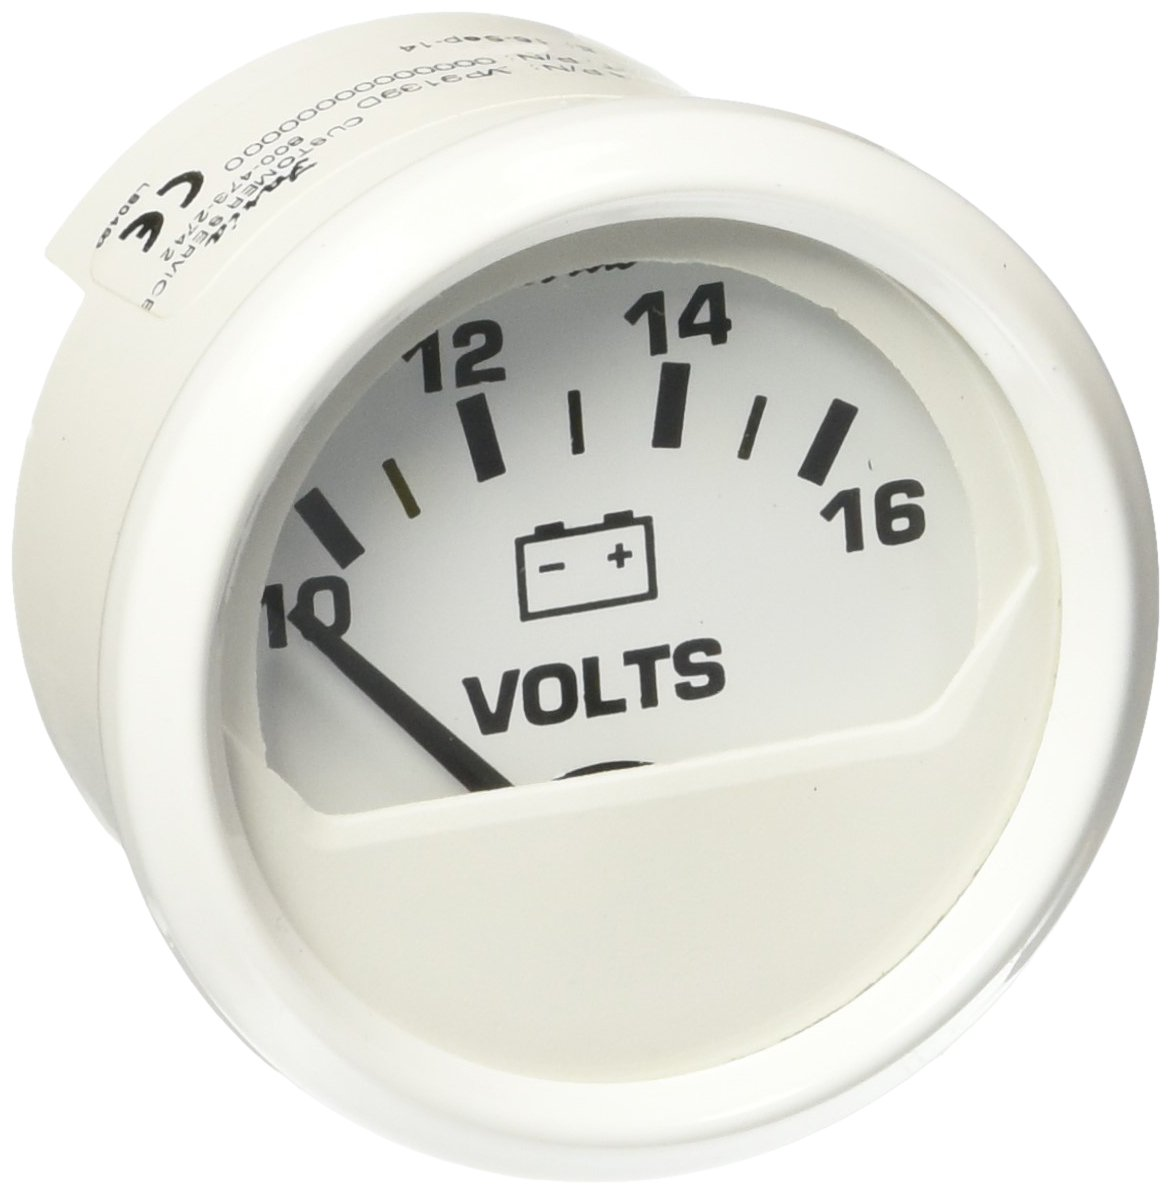 Faria 13120 Voltmeter (3003.352) Faria Beede Instruments 3003.3520 678-13120